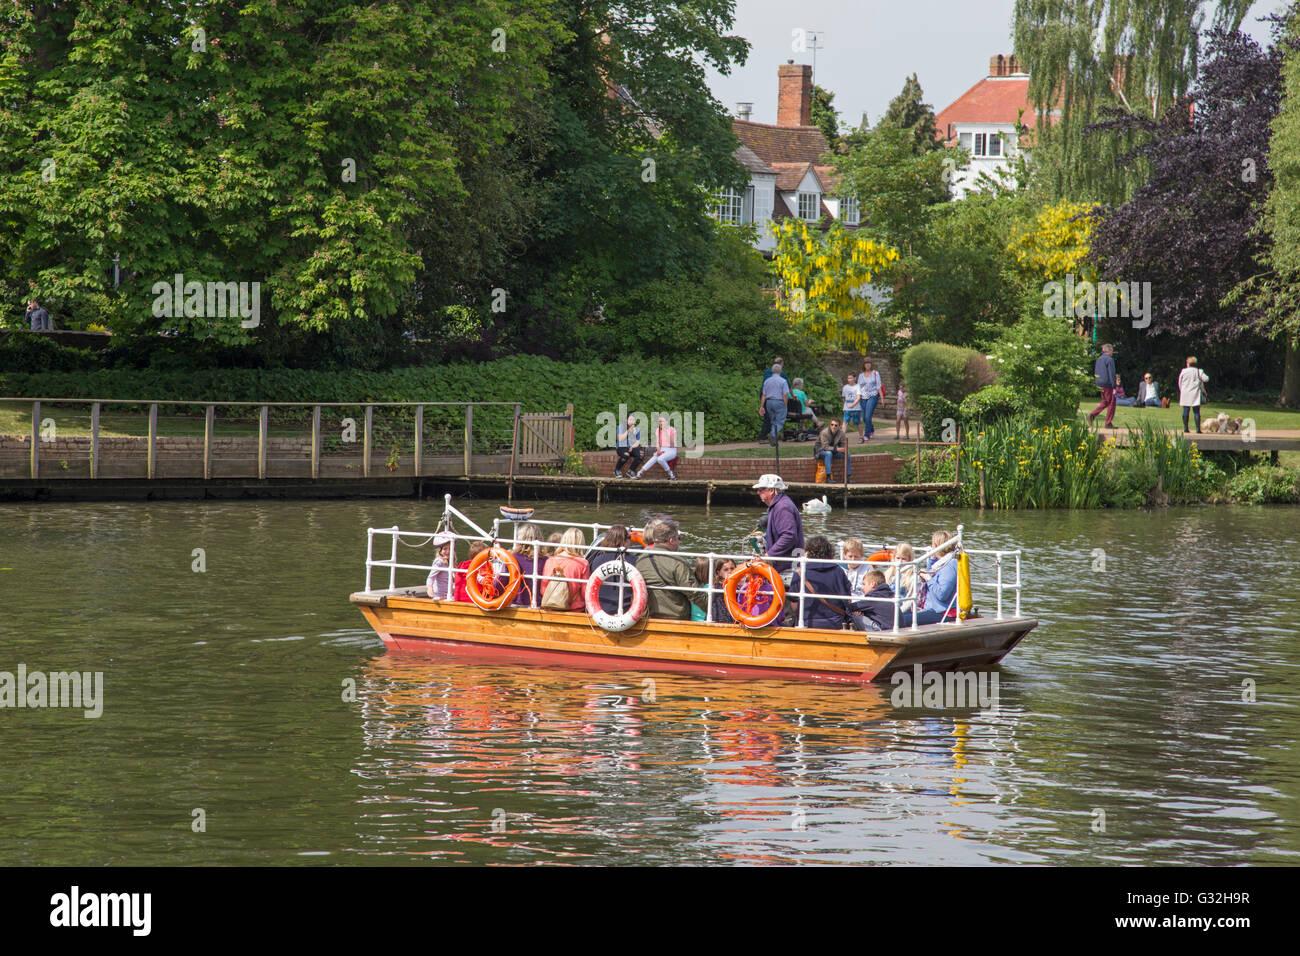 Passenger Ferry on the River  Avon, Stratford upon Avon, Warwickshire, England, UK - Stock Image